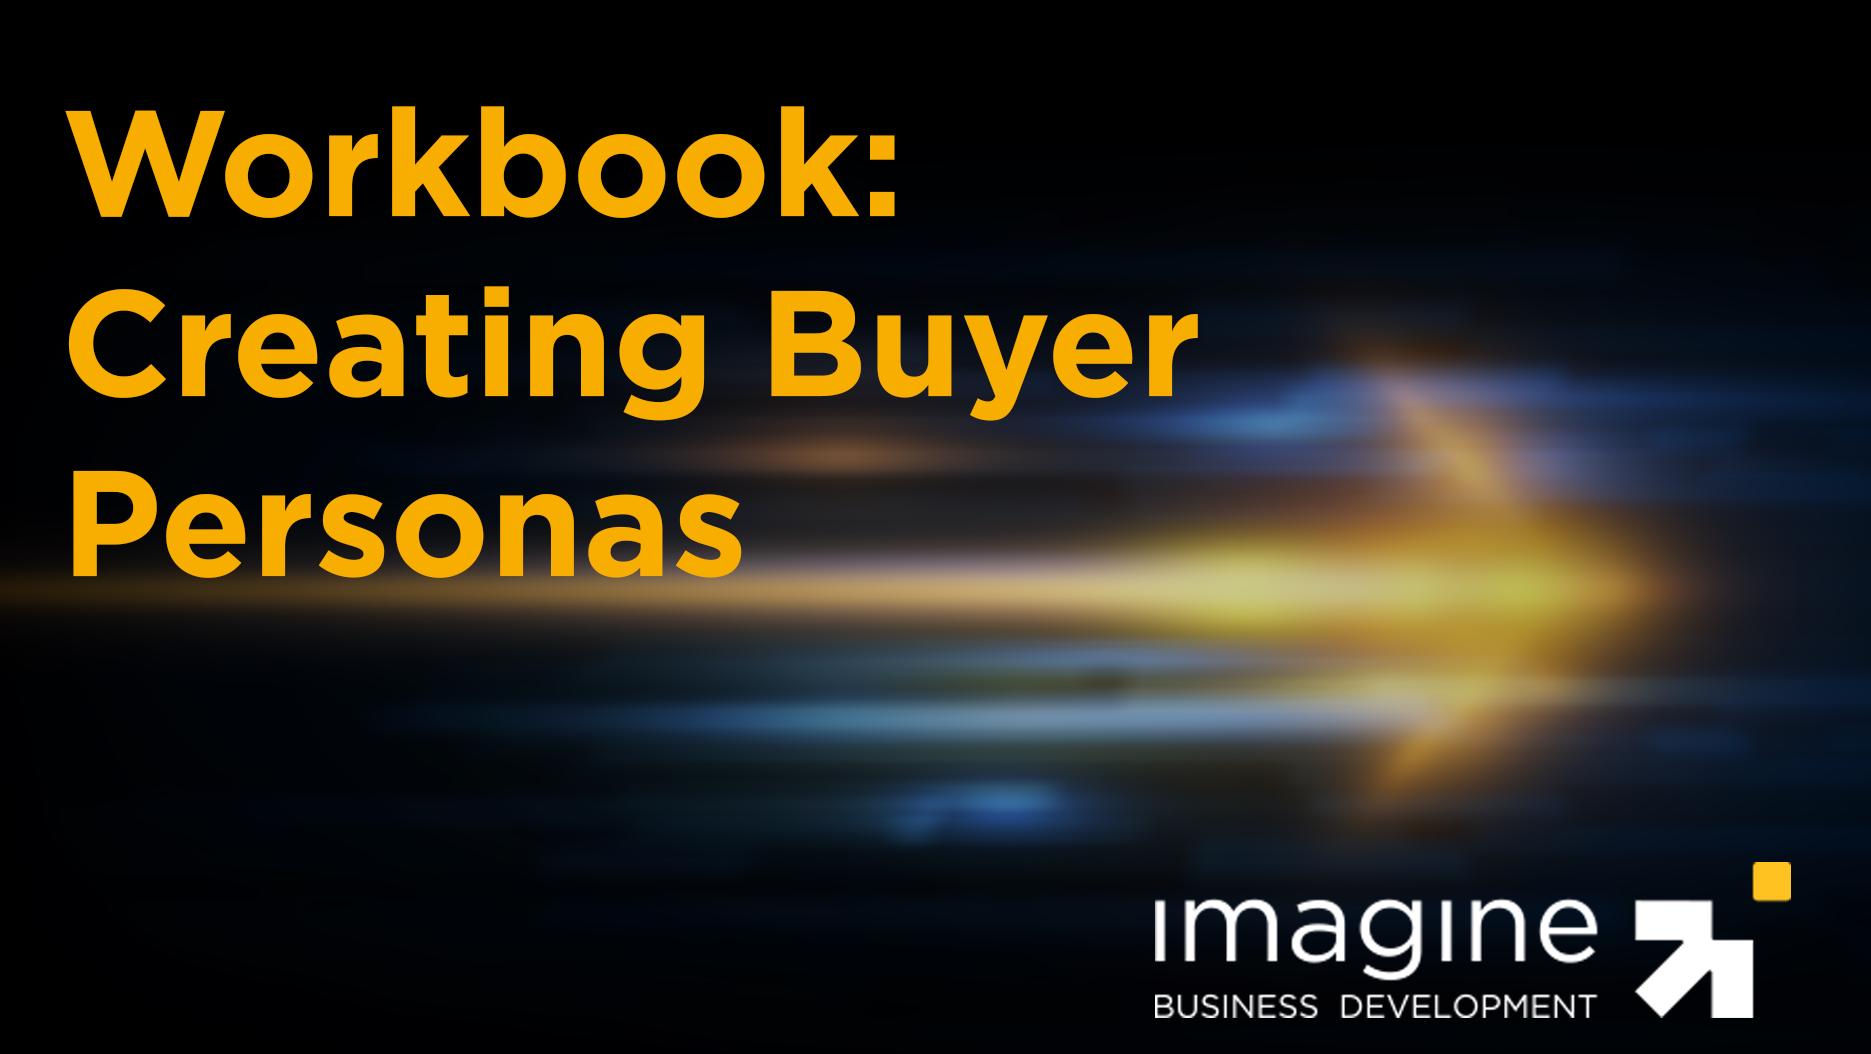 Workbook: Creating Buyer Personas